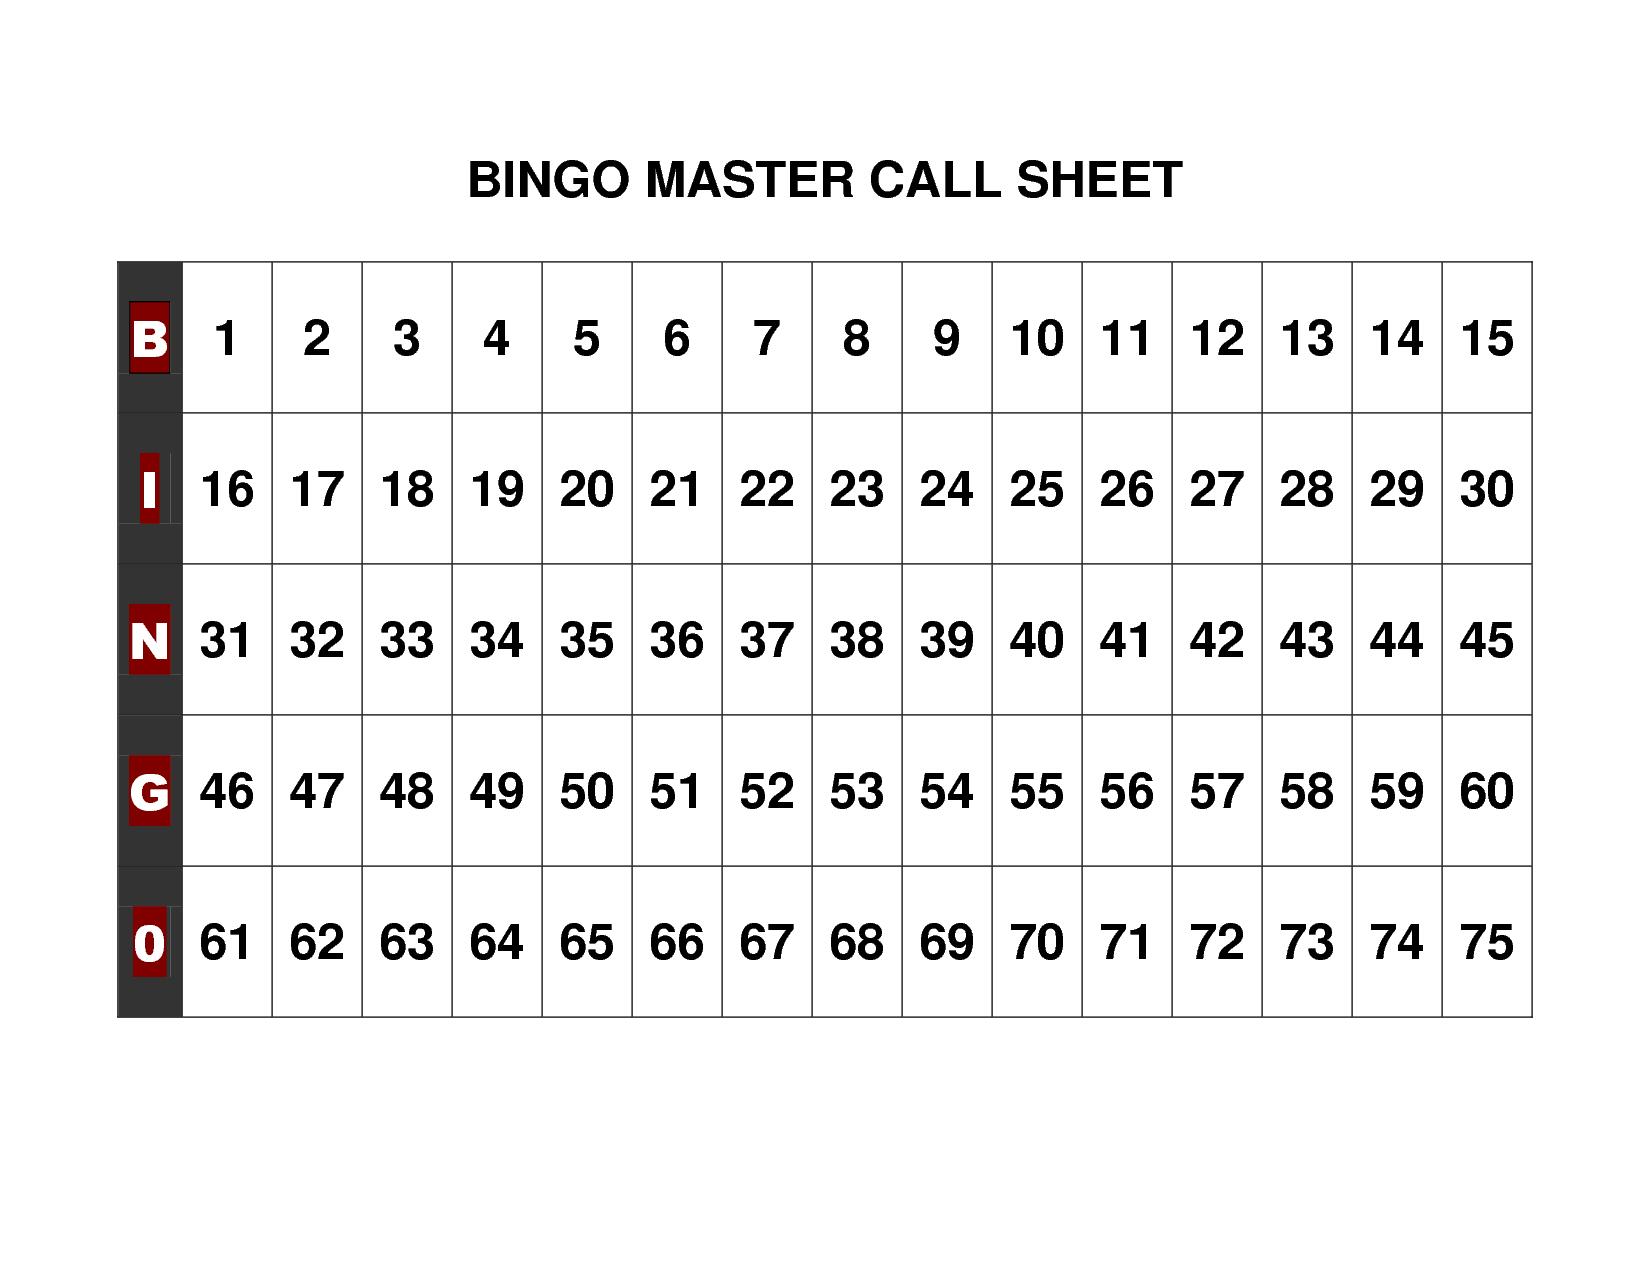 Free+Printable+Bingo+Call+Sheet   Bingo   Pinterest   Bingo Calls - Free Printable Bingo Chips